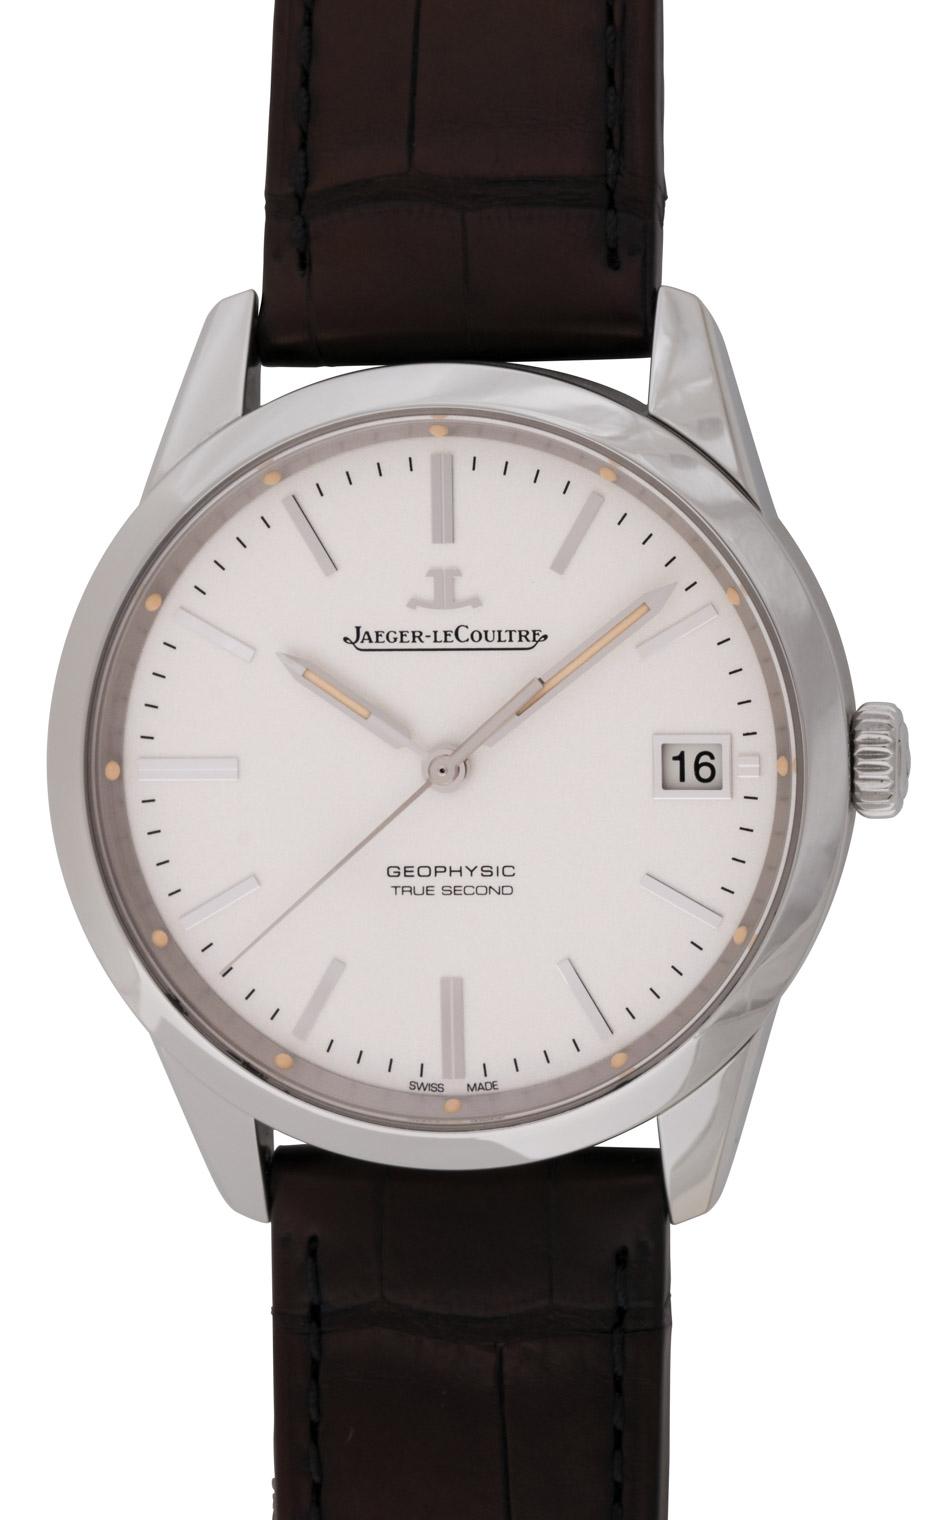 Jaeger lecoultre geophysic true second q8018420 bernard watch for Geophysic watches